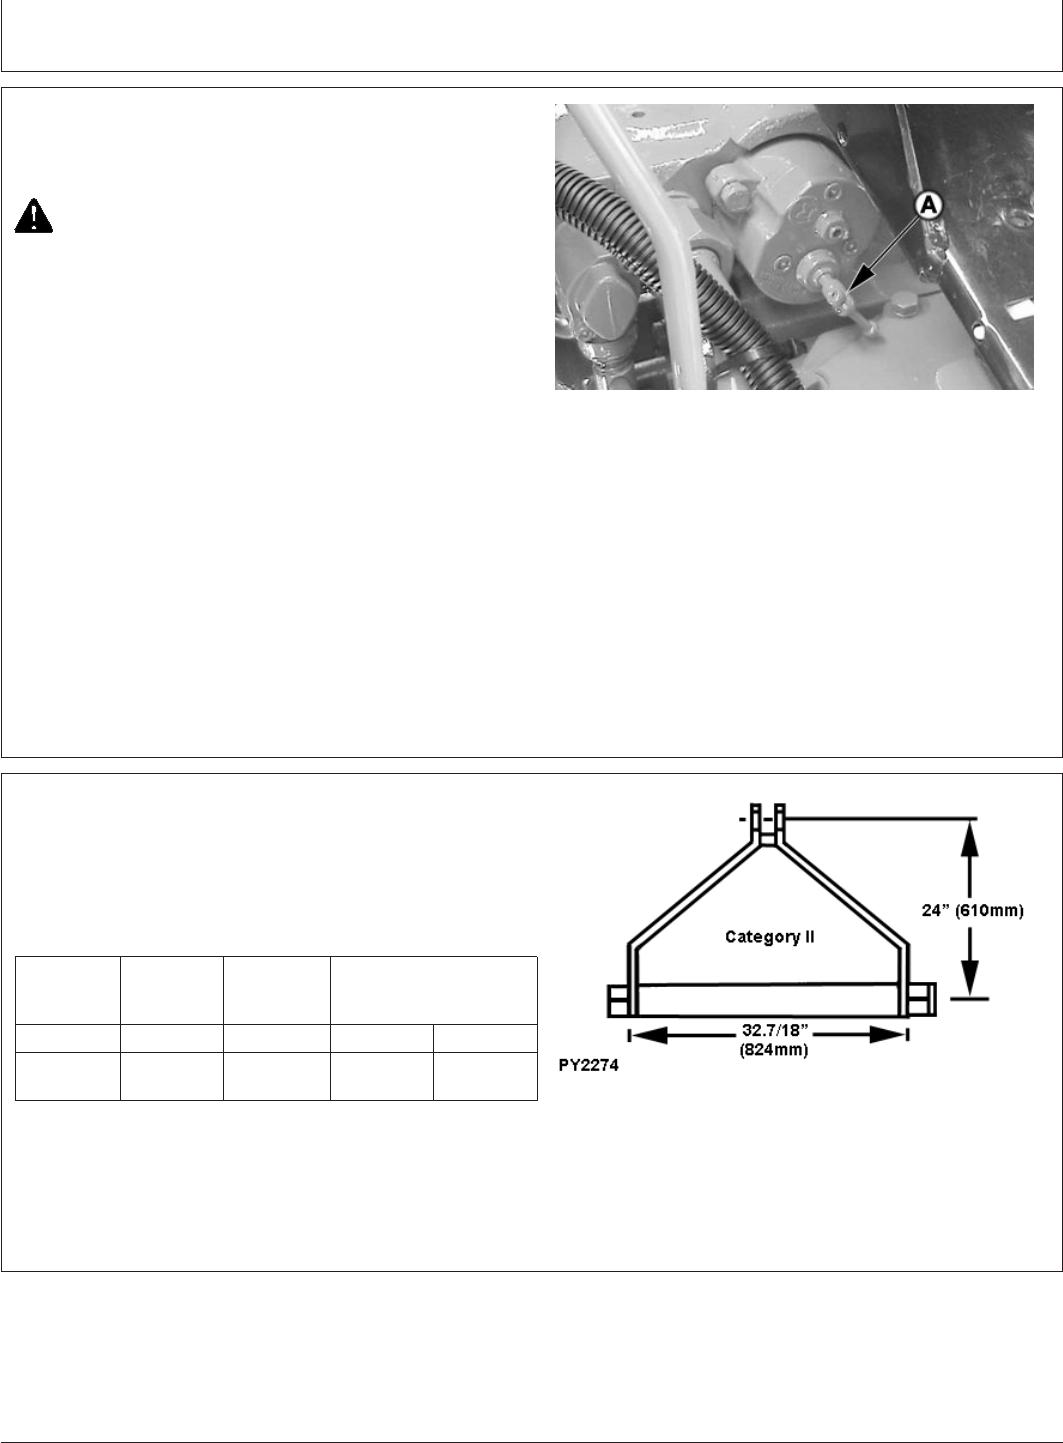 John Deere 5310 S Users Manual 013231unit Wiring Diagram Rockshaft And 3 Point Hitch